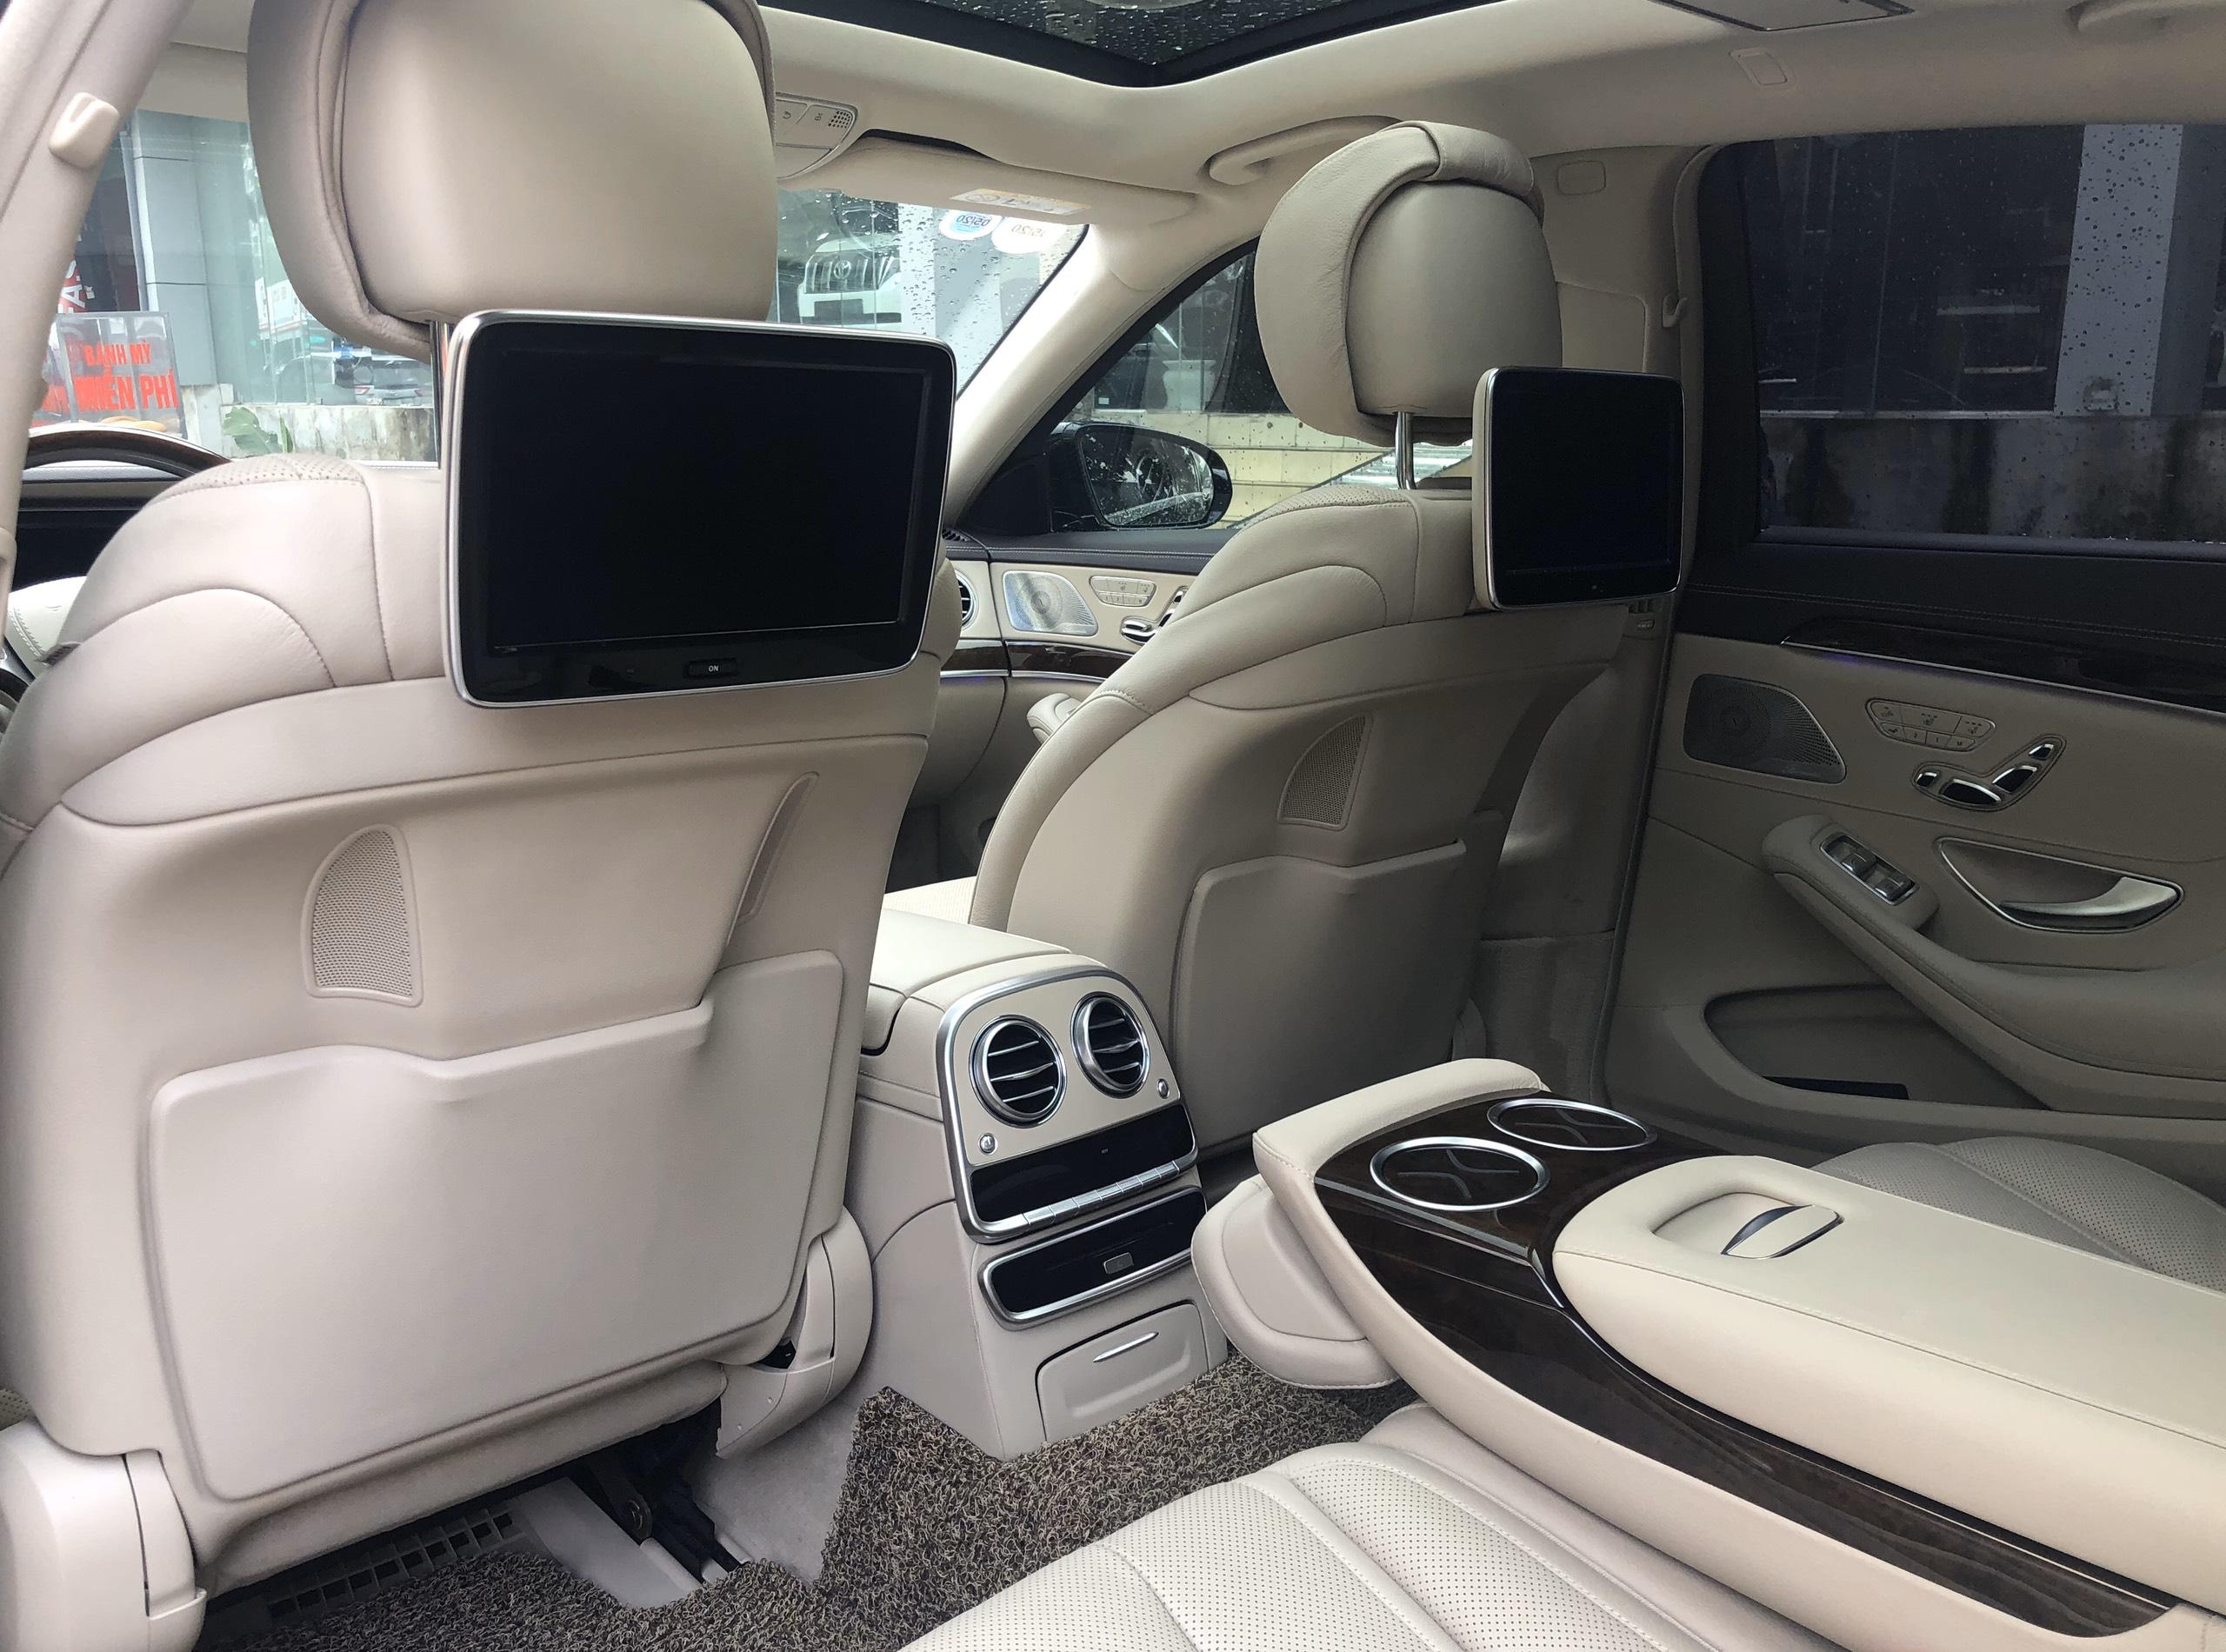 Mercedes Benz S400 2015